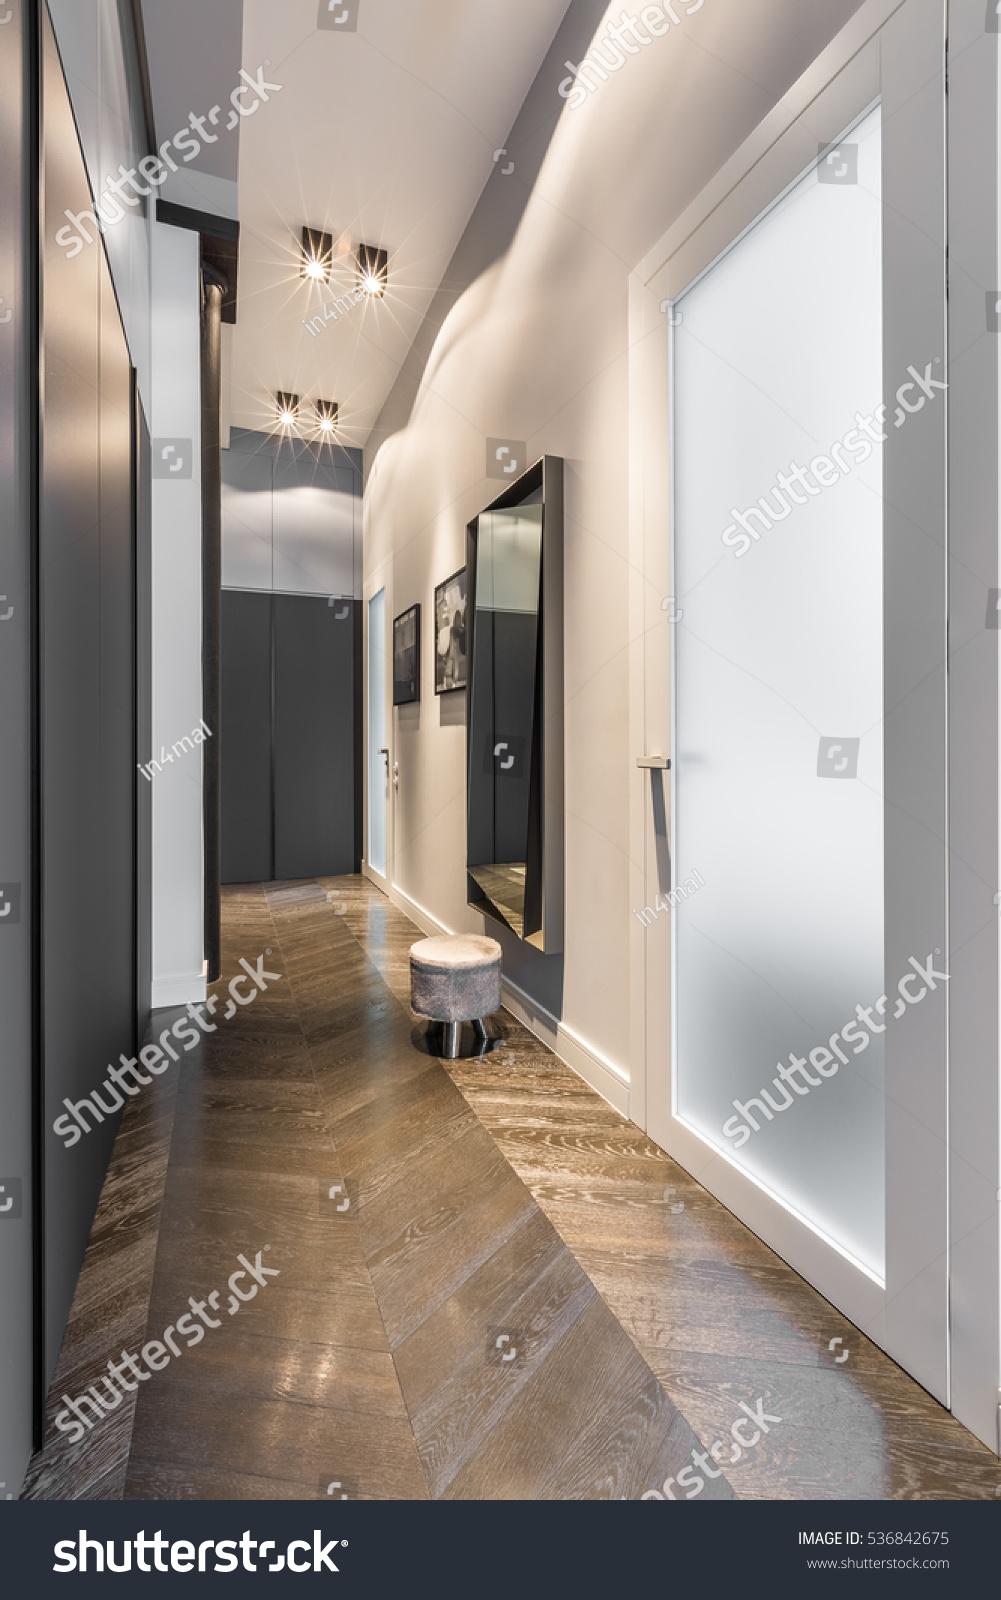 Home corridor with black wardrobe and wooden floor